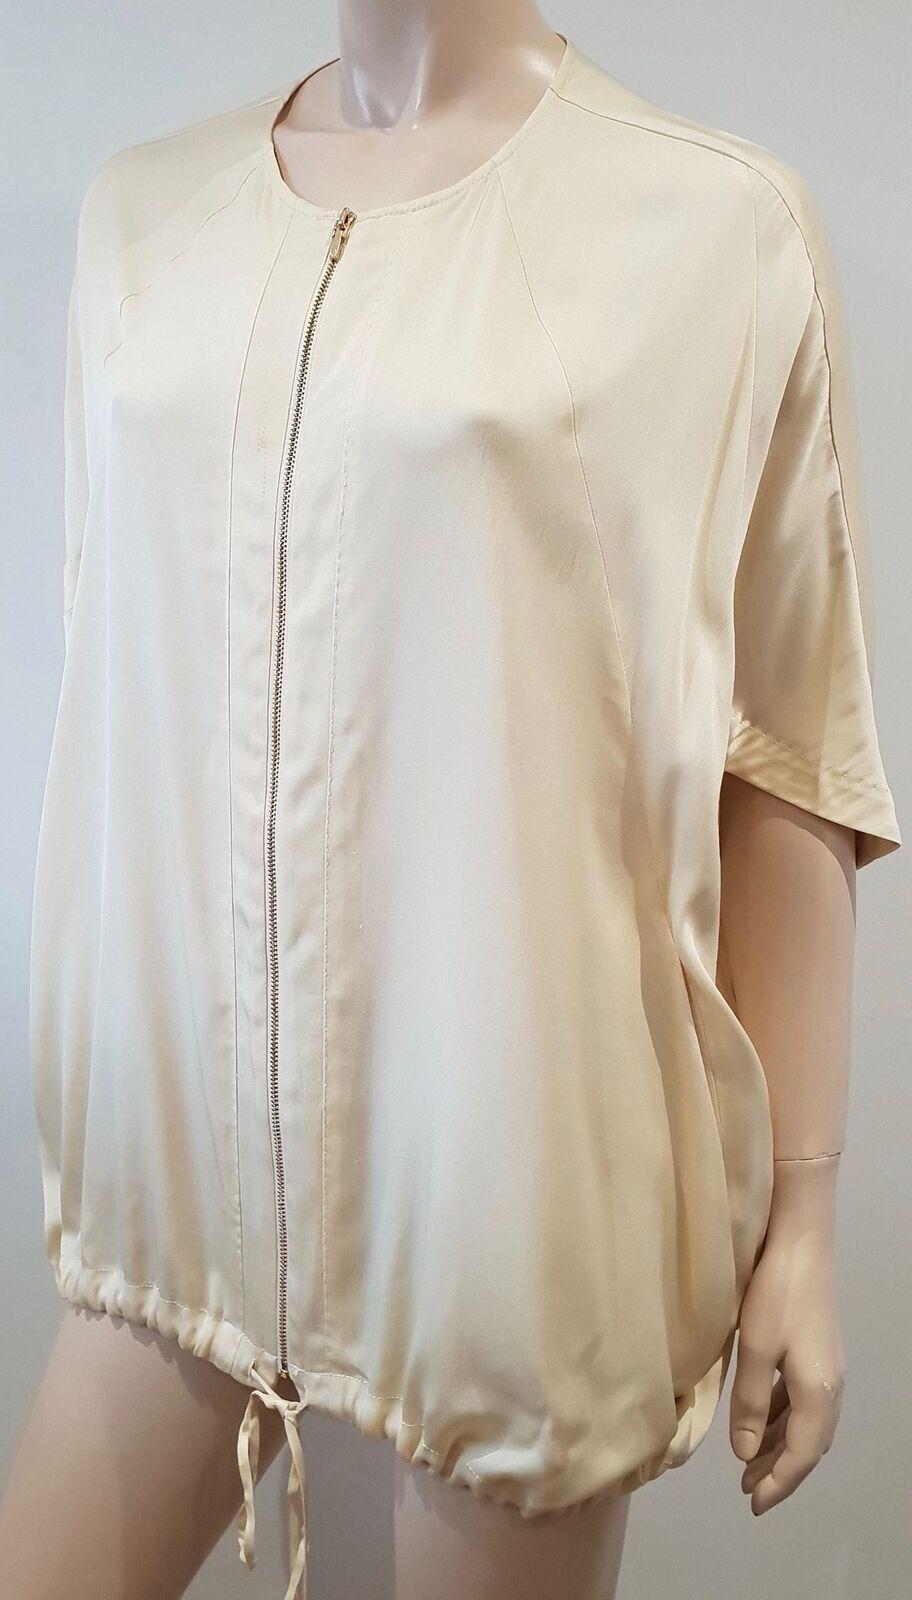 TORY BURCH Cream Silk Short Sleeve Zip Fastened Short Sleeve Blouse Top 6 UK10